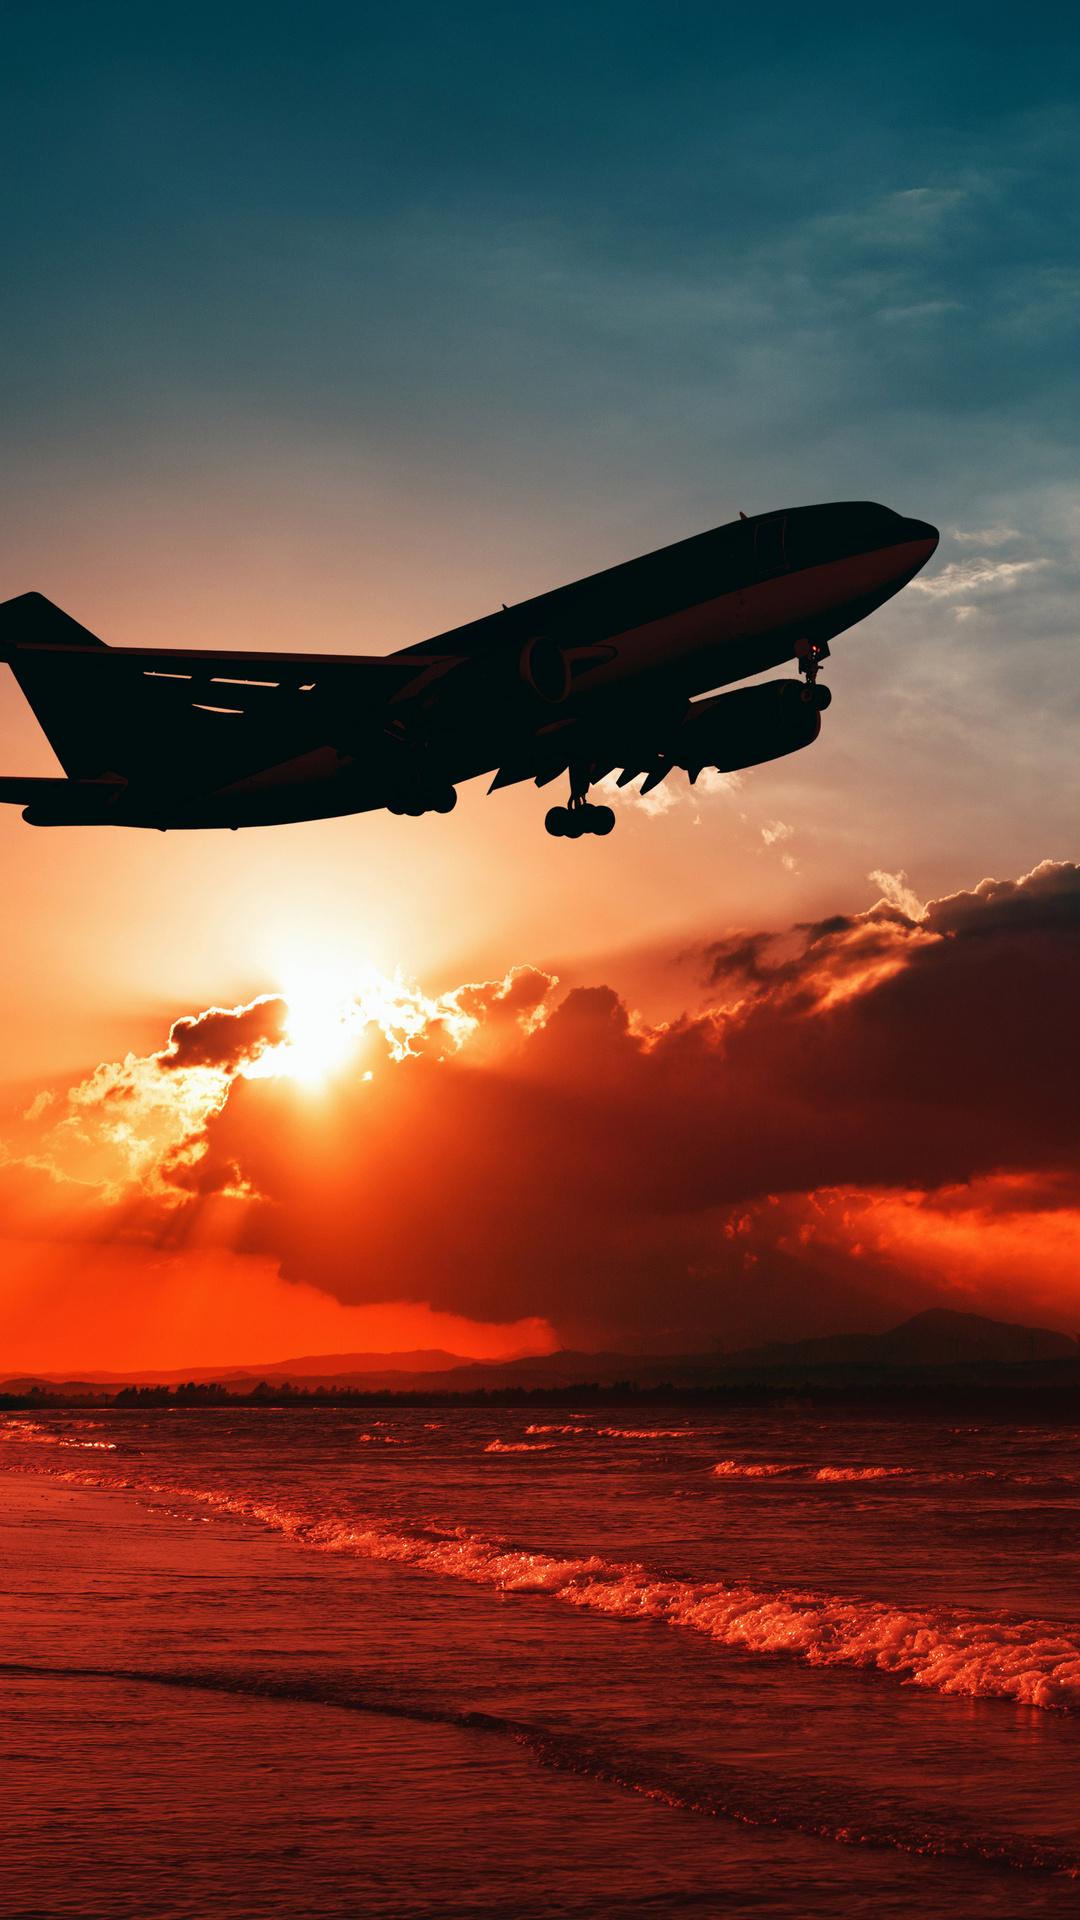 Airplane Flying Over Beach Shore Sunset 5k L9